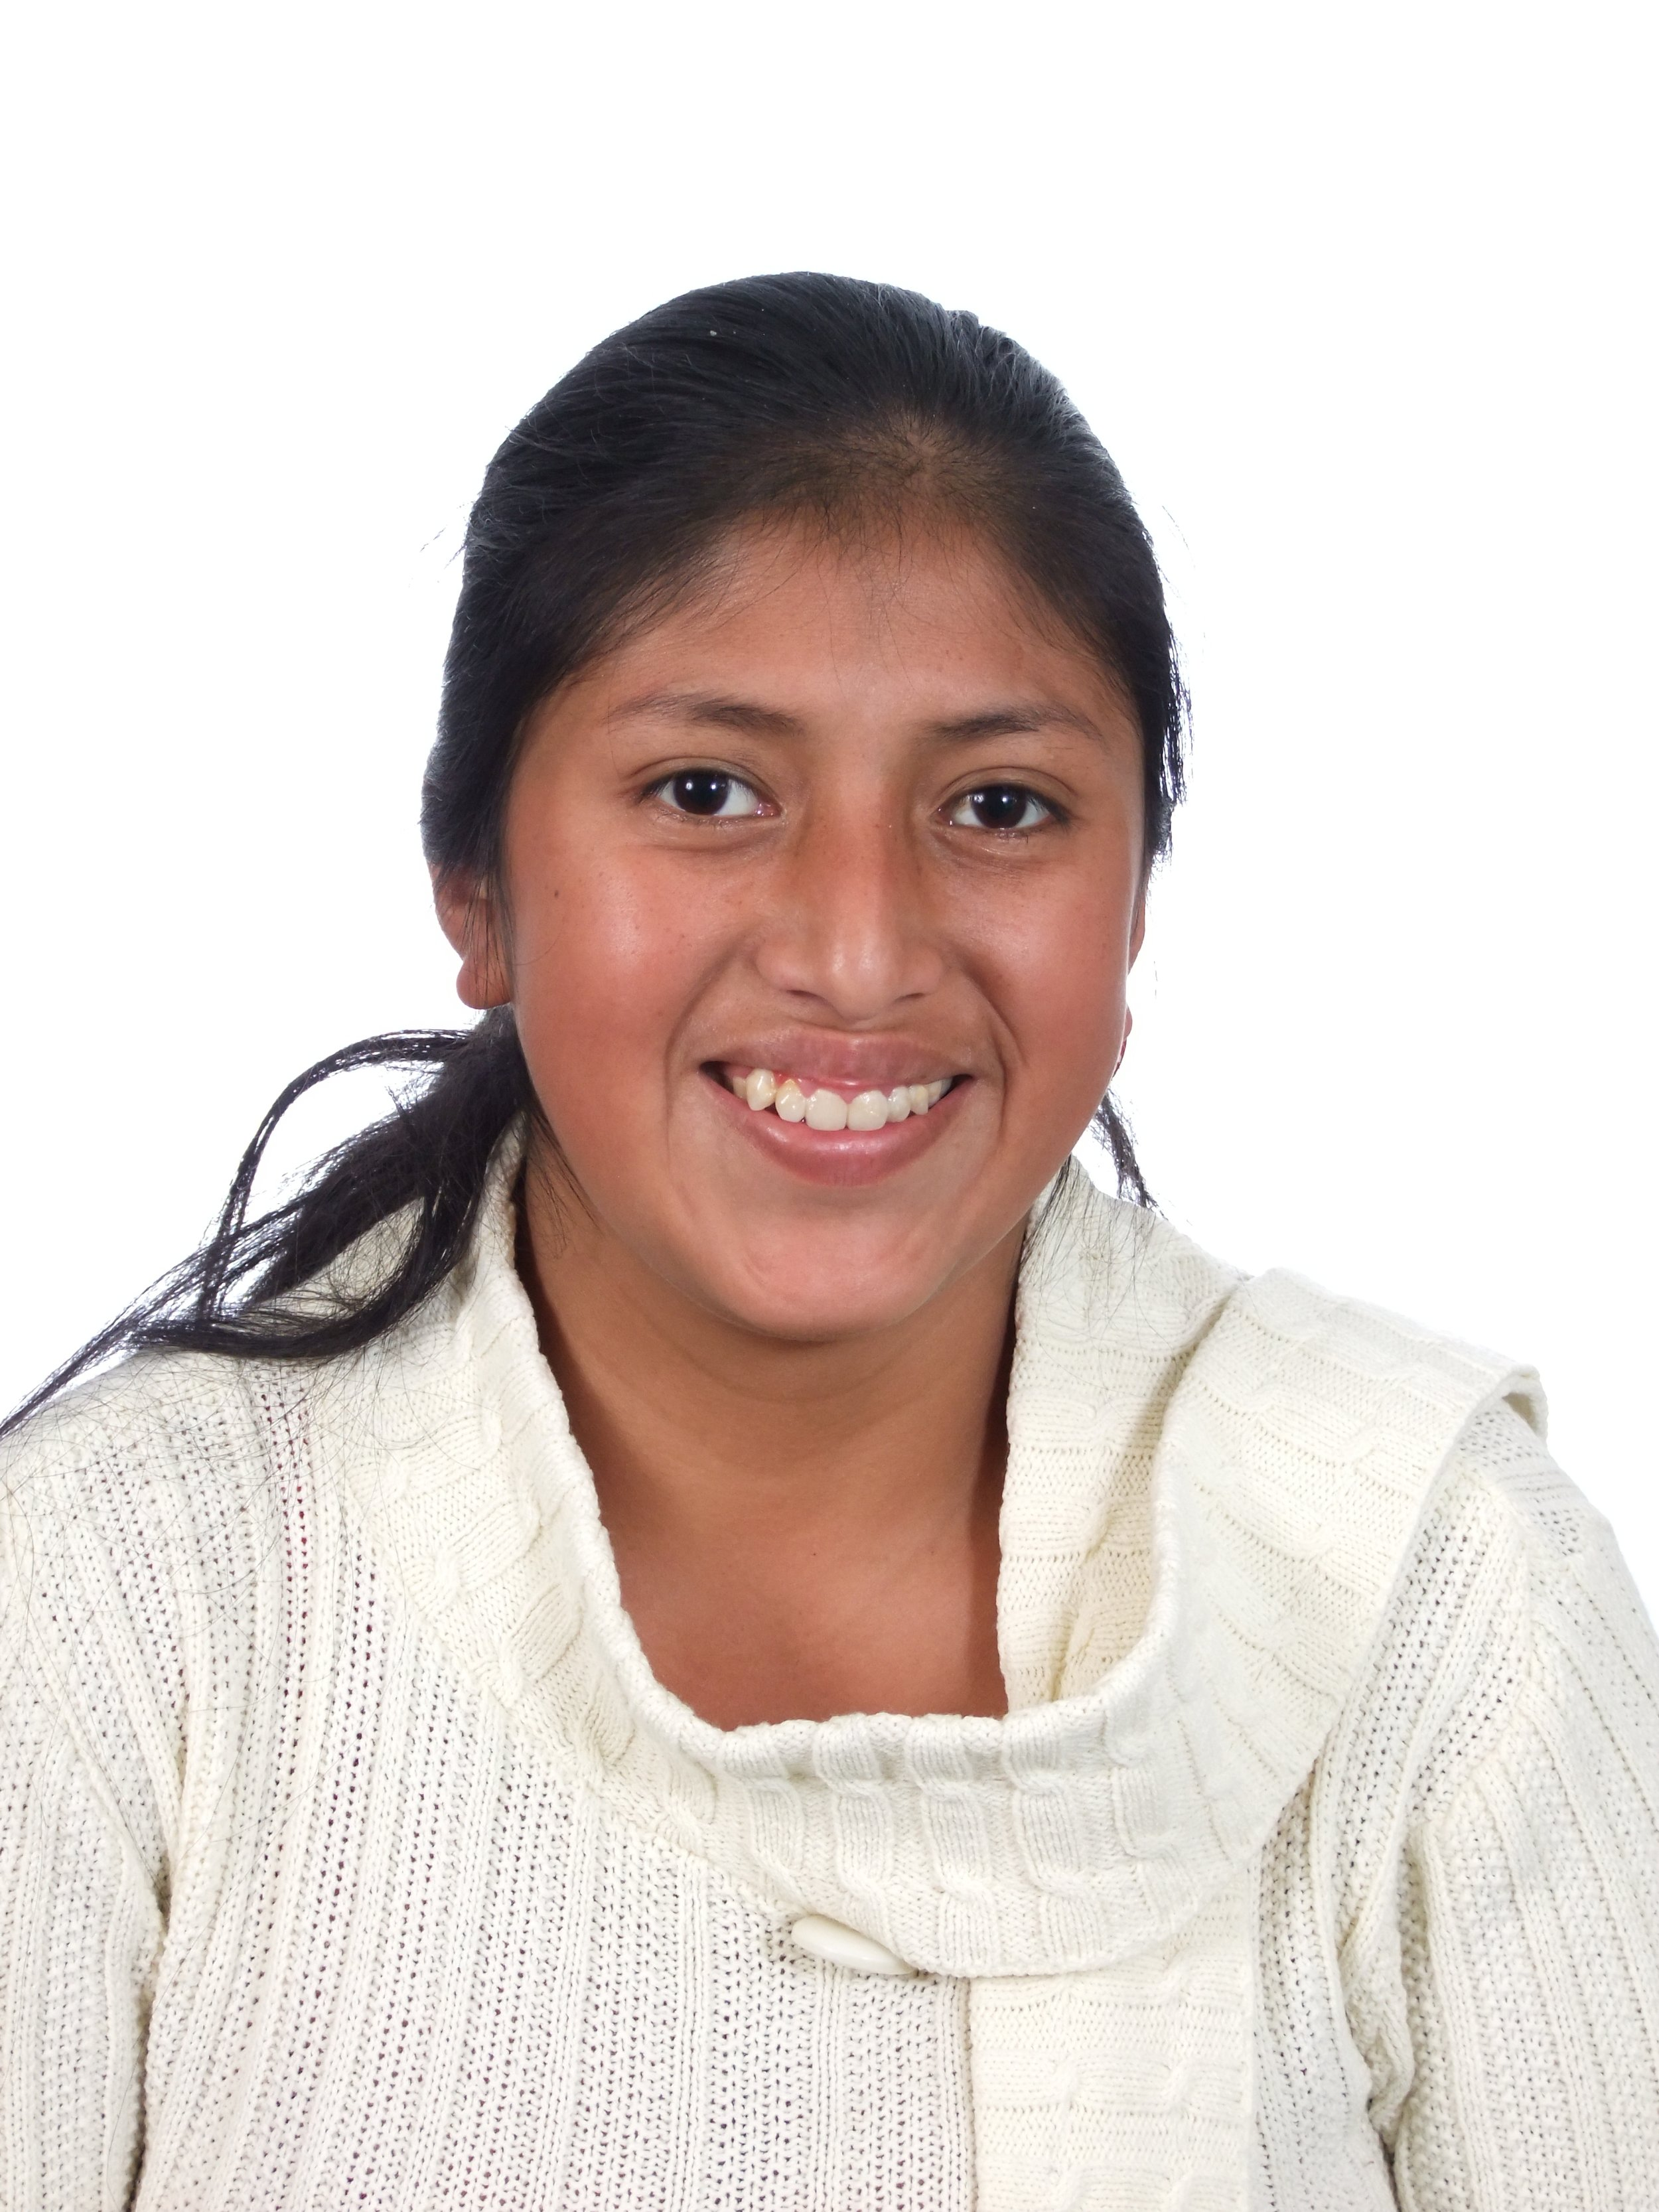 Gabriela Maita, Knitter